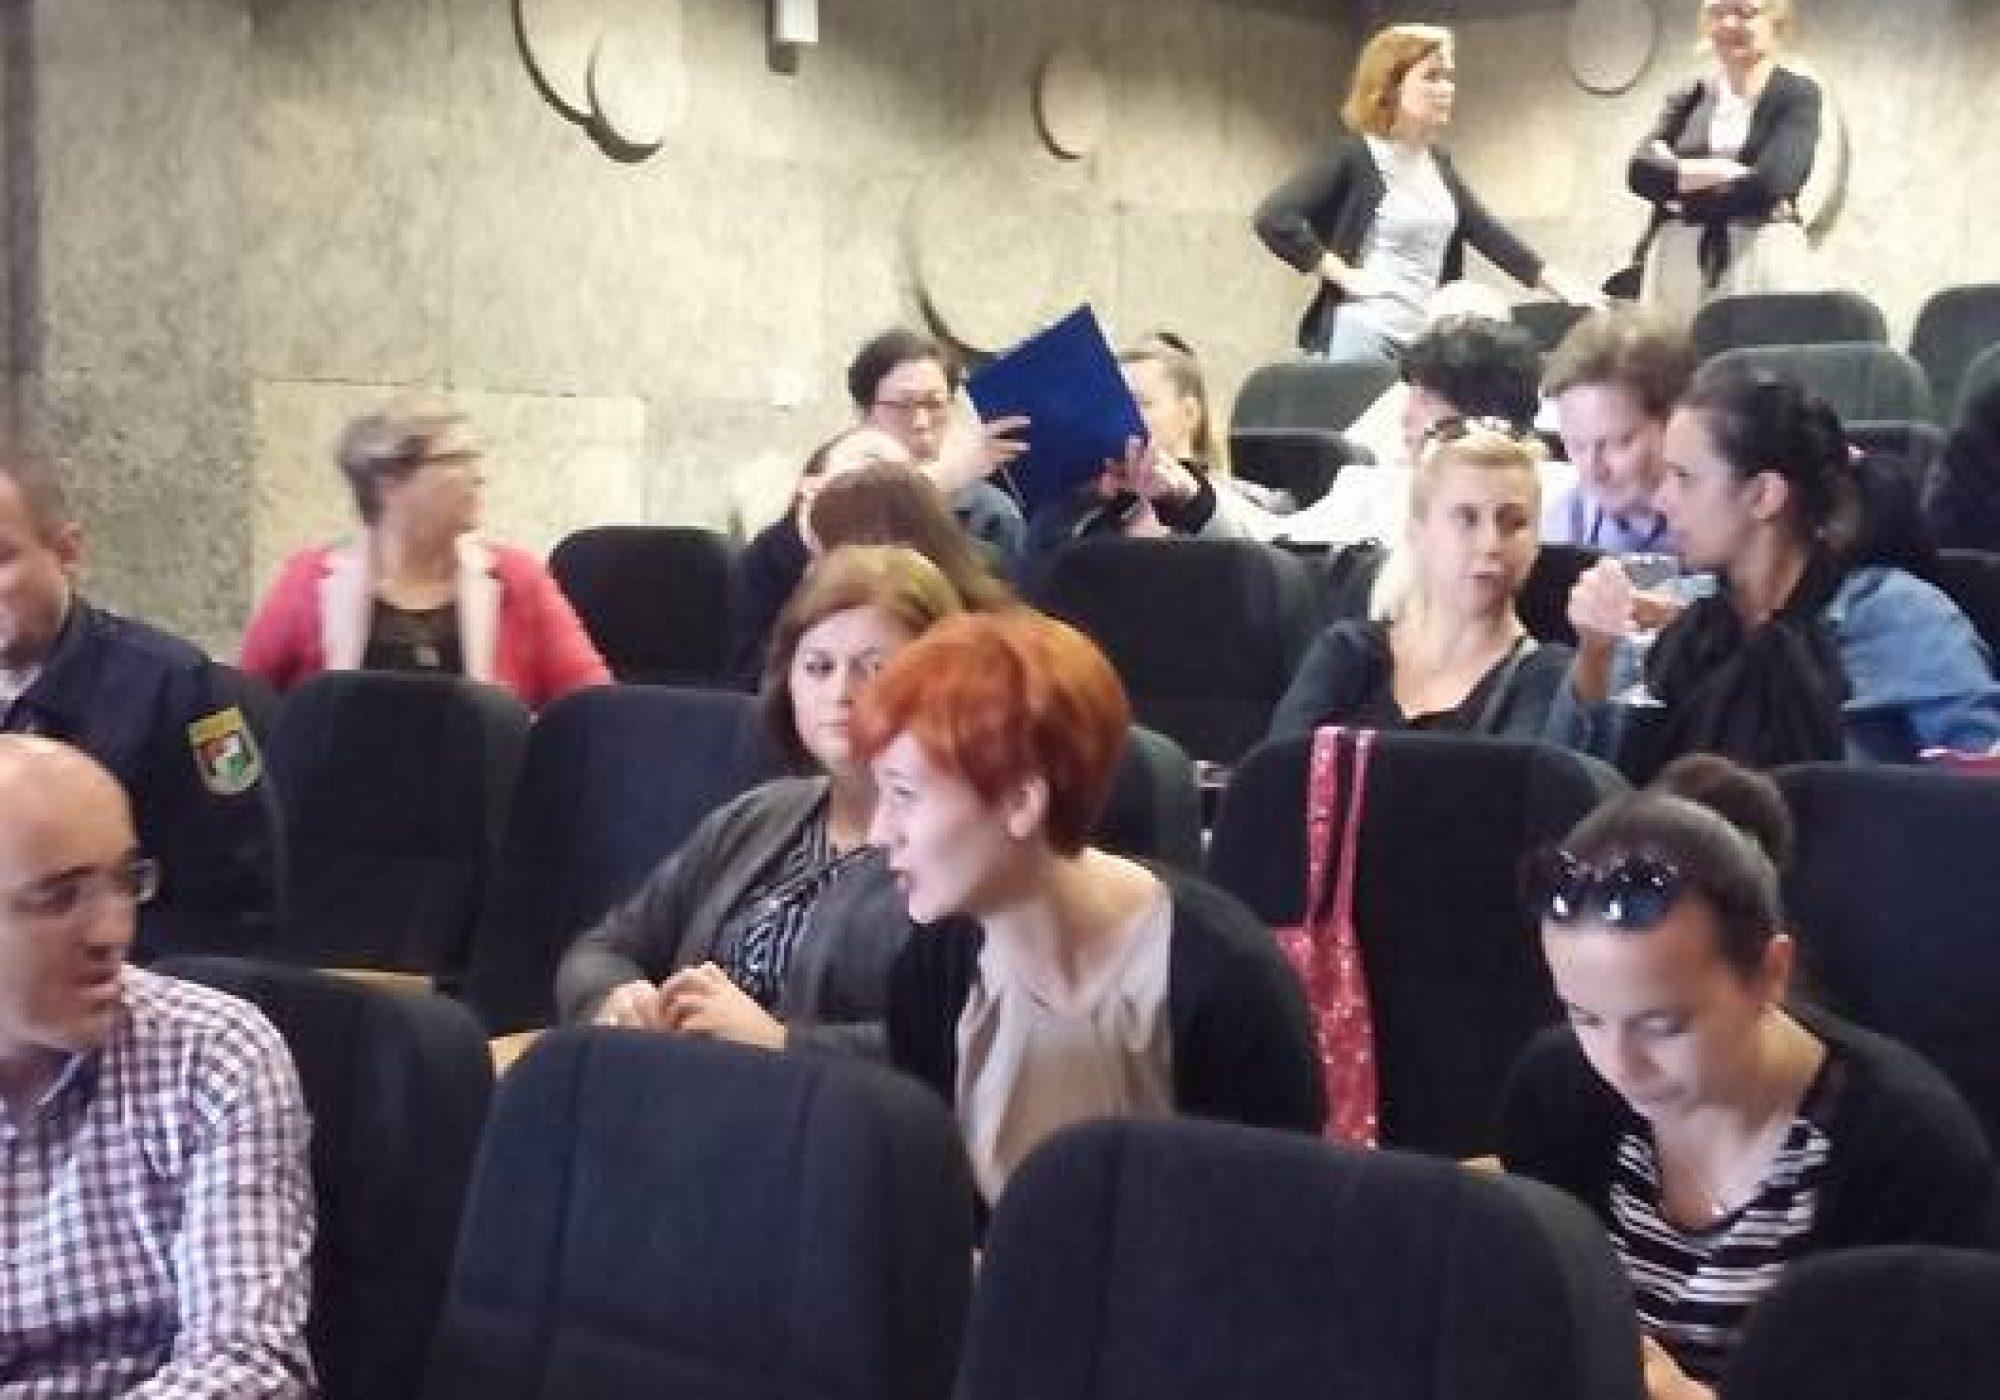 Održan seminar u Vitezu u organizaciji Gender centra FBiH